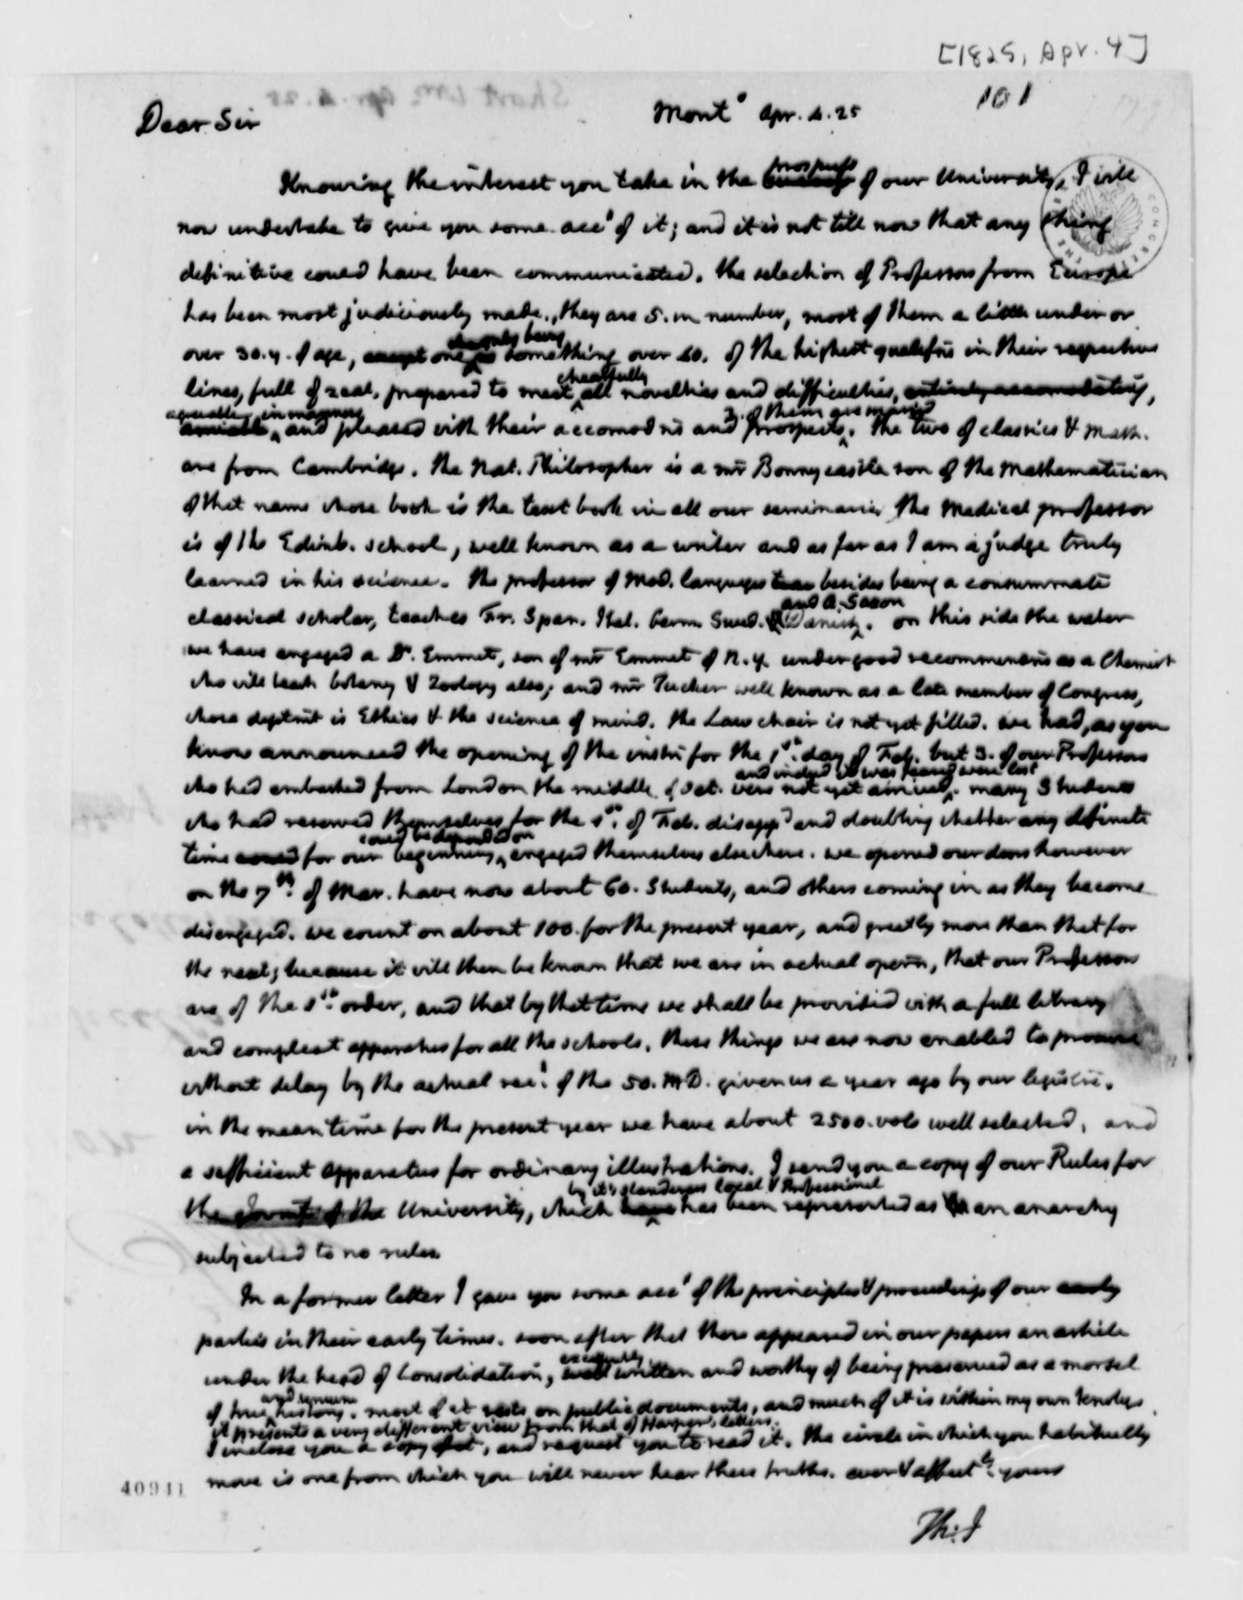 Thomas Jefferson to William Short, April 4, 1825